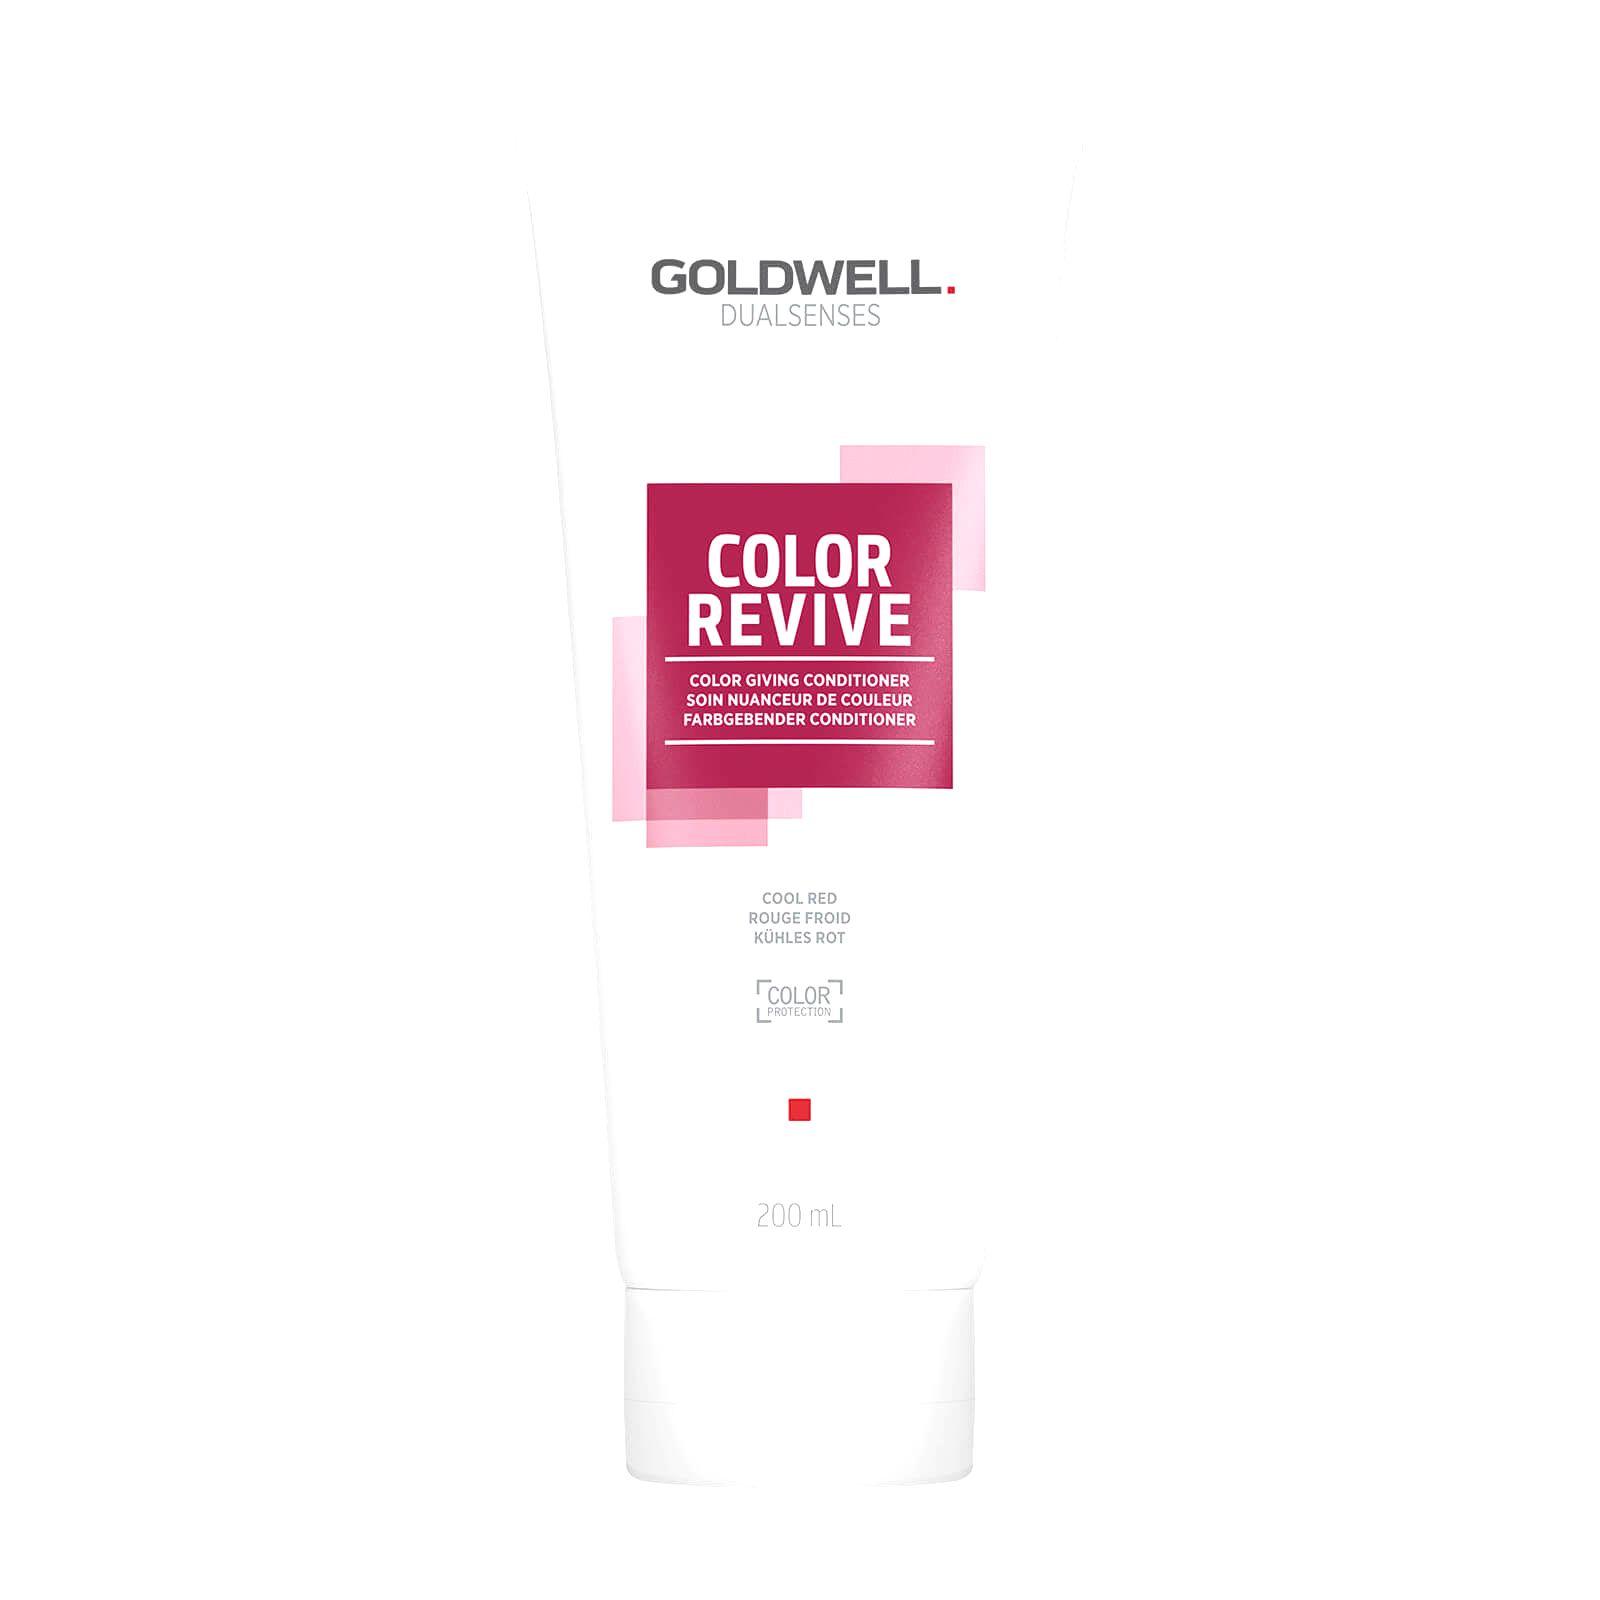 Goldwell Tónovacie kondicionér Cool Red Dualsenses Color Revive ( Color Giving Condicioner)200 ml